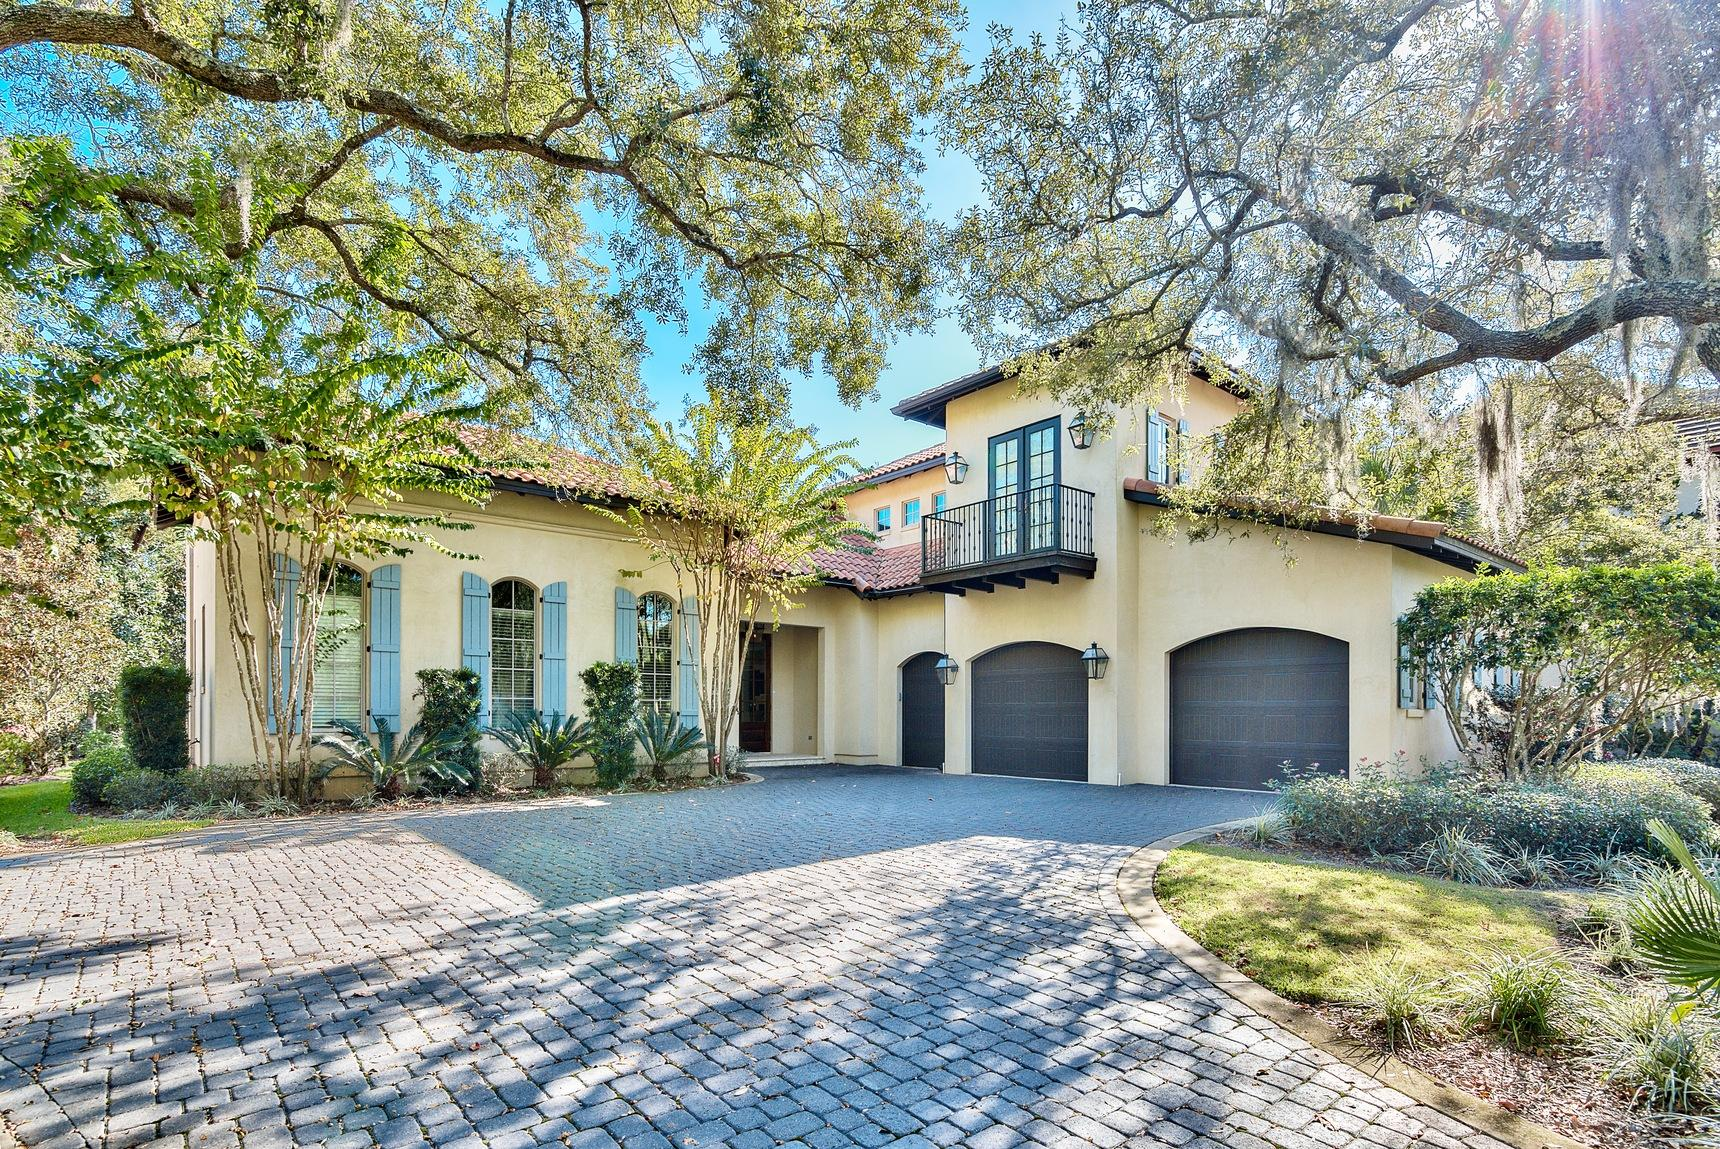 Photo of home for sale at 3551 Preserve, Miramar Beach FL